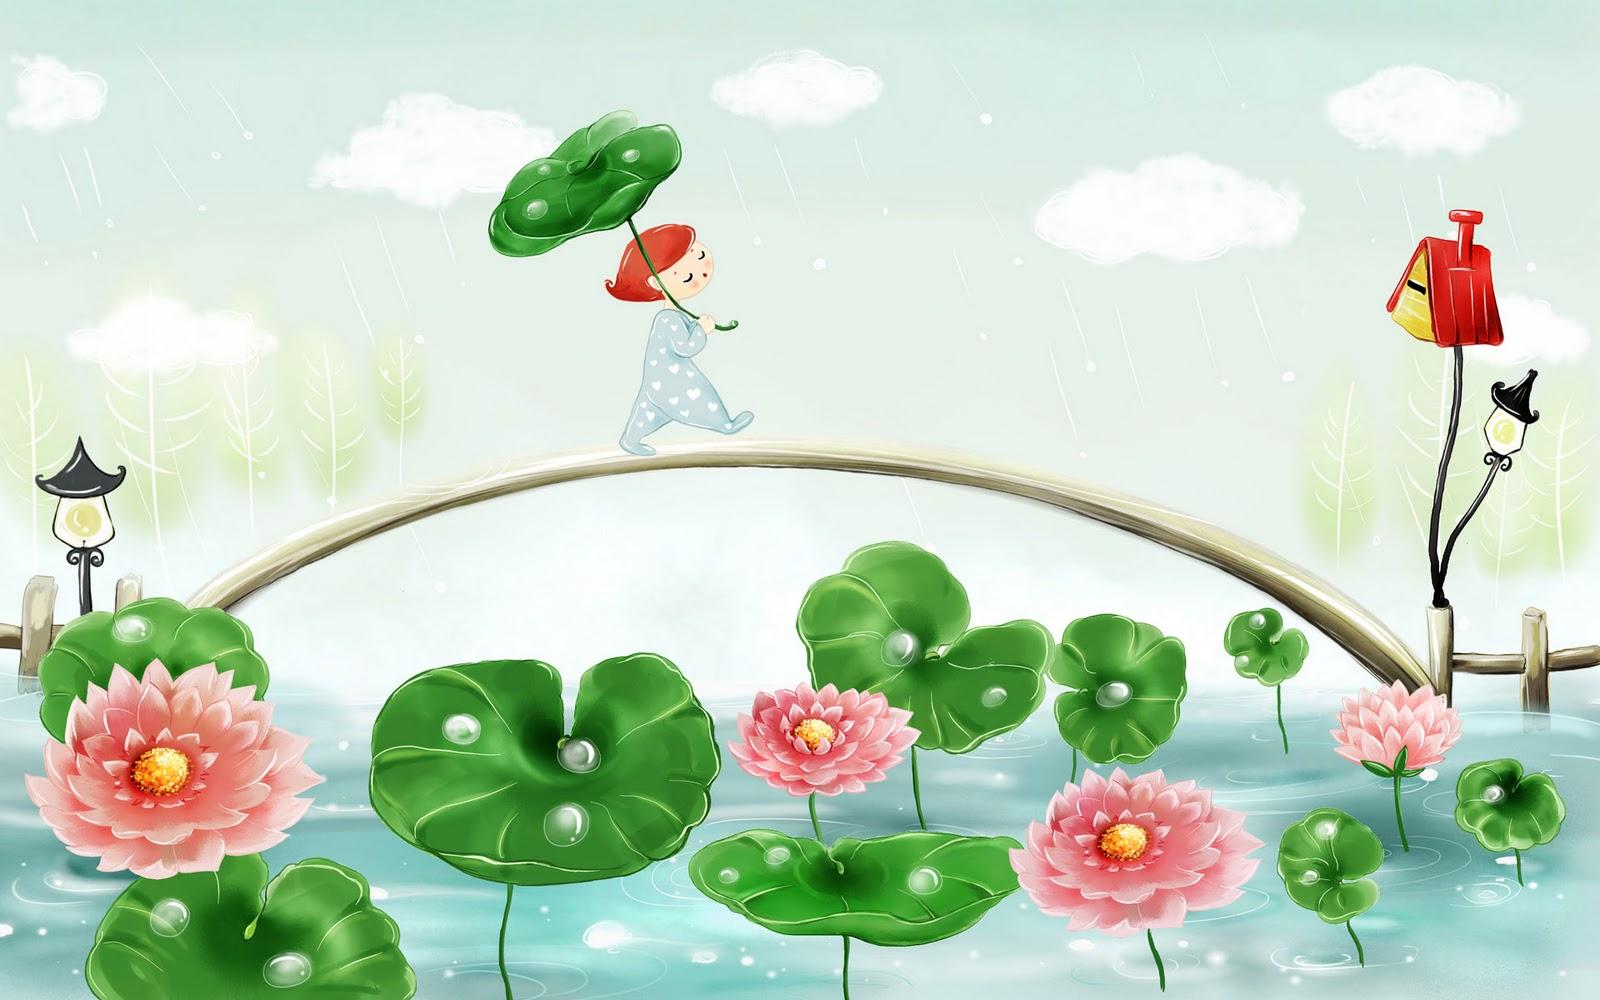 http://2.bp.blogspot.com/_g31KVvREHW4/TPh1vYdTRHI/AAAAAAAABGE/964ohcHHoLI/s1600/Cartoon%2Bwallpapers%2B%25252812%252529.jpg